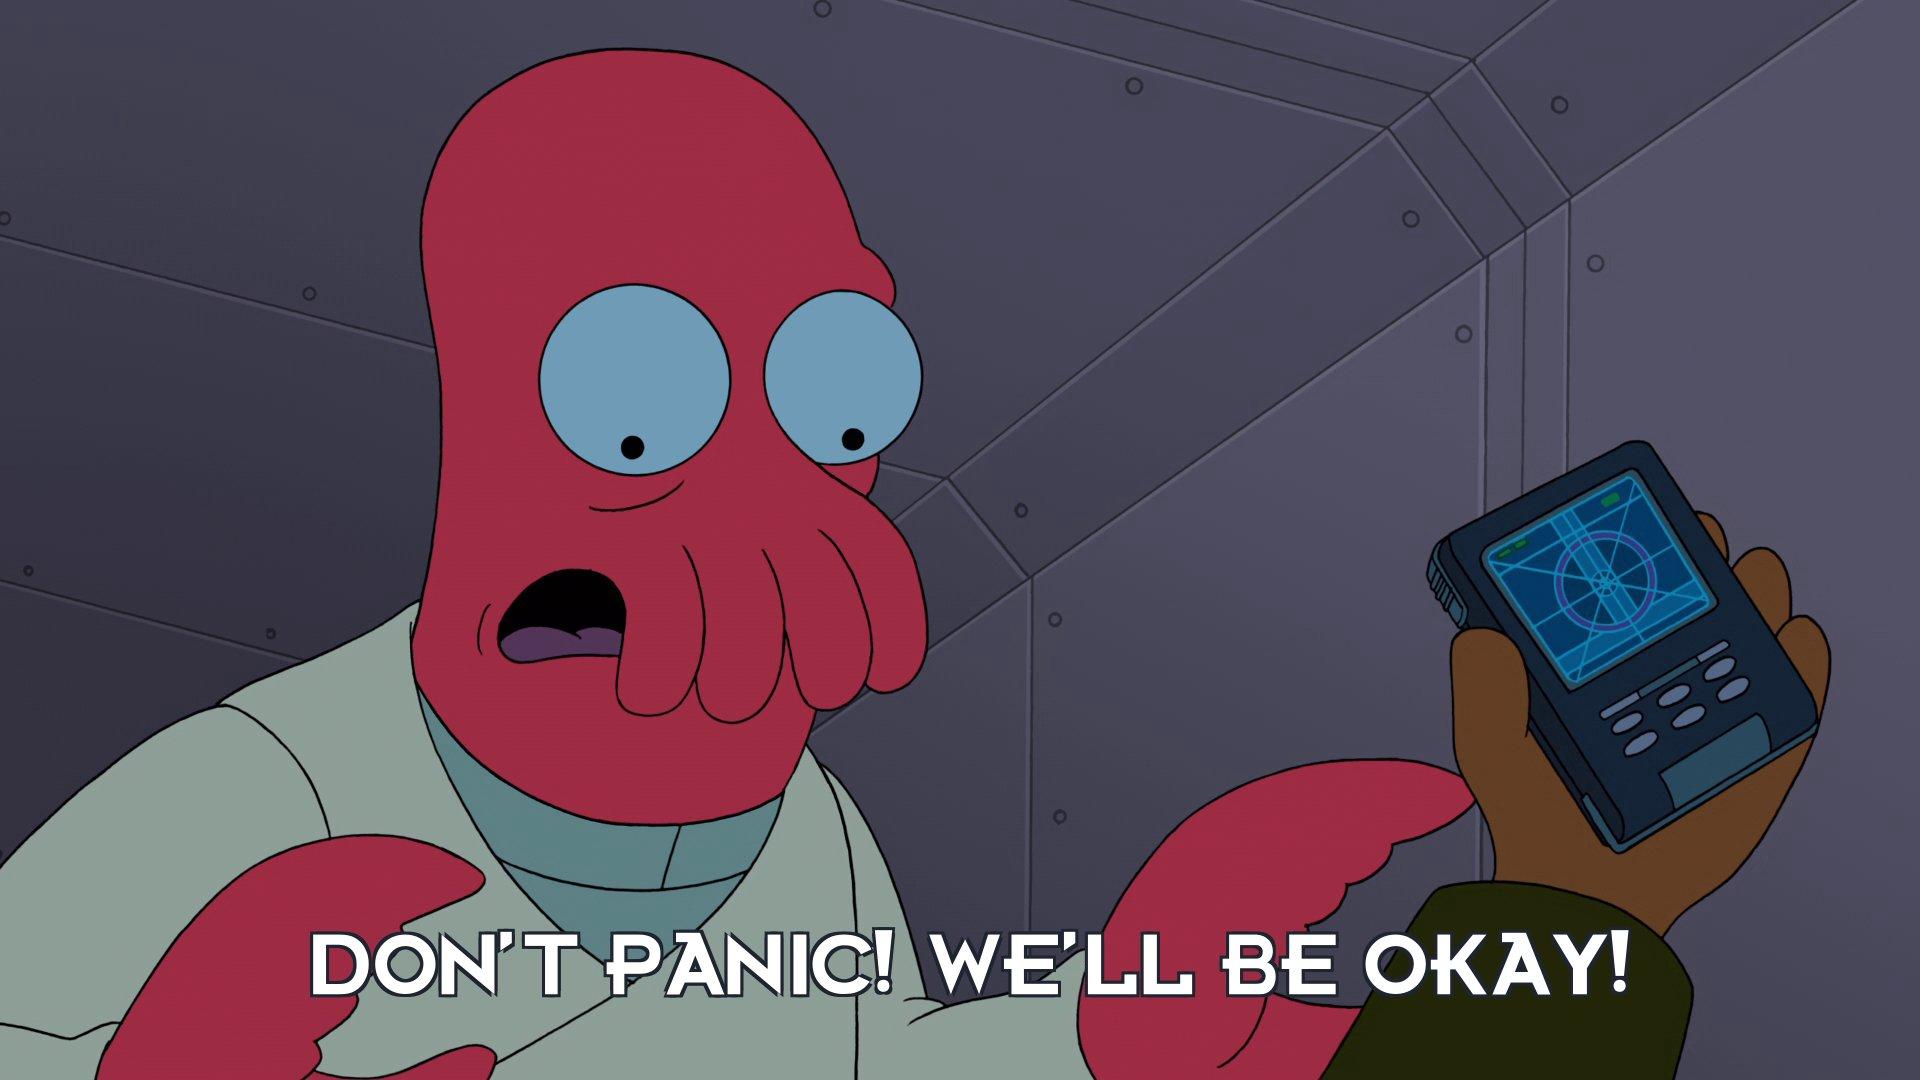 Dr John A Zoidberg: Don't panic! We'll be okay!